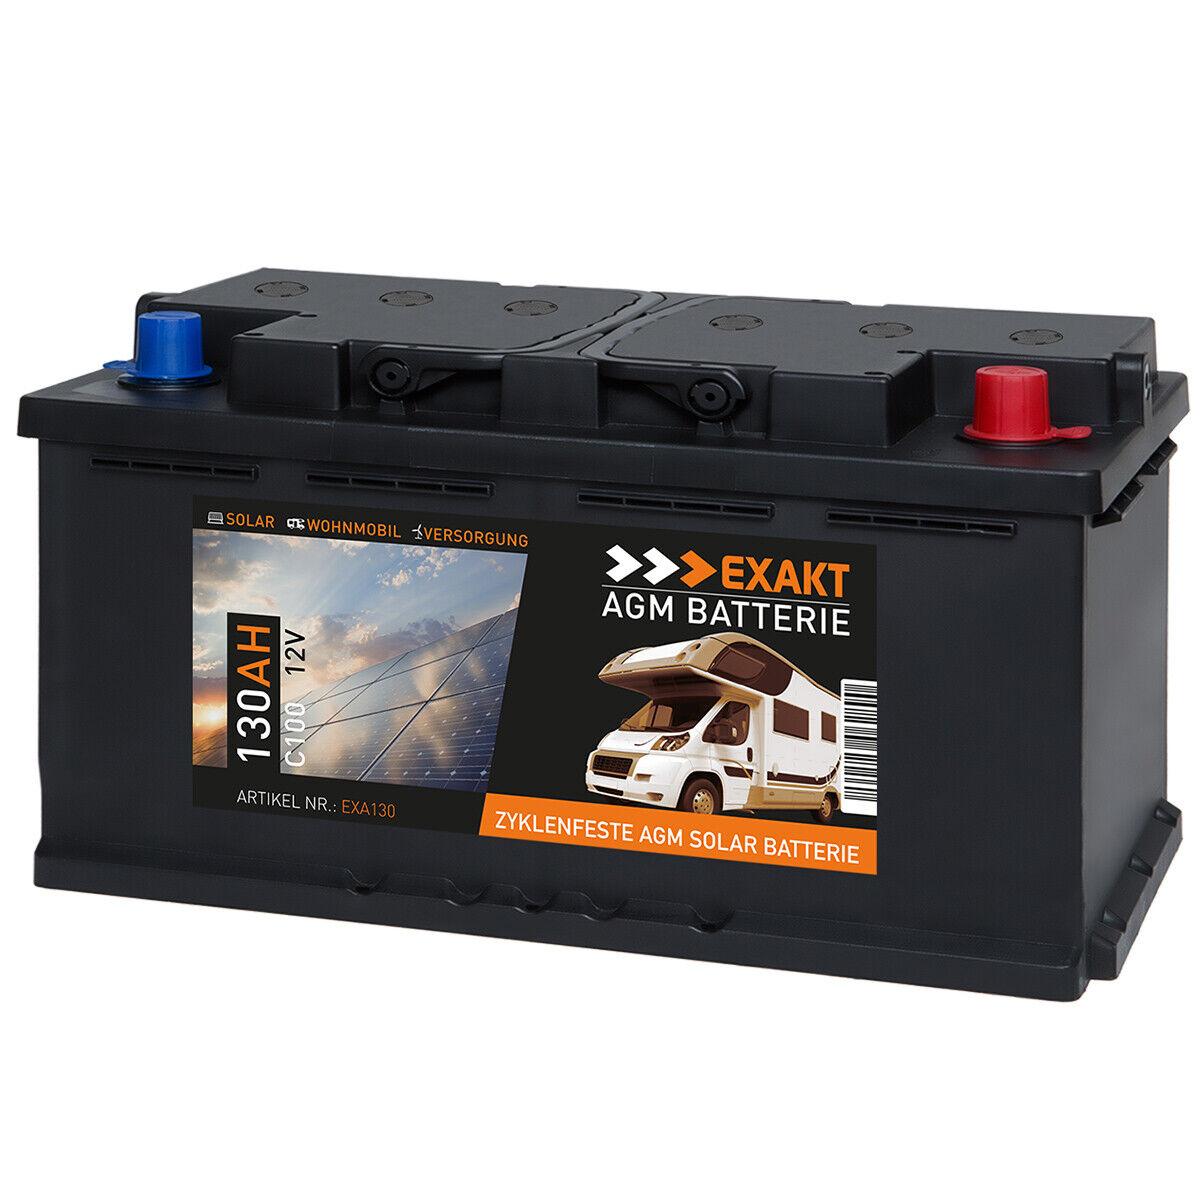 SOLIS Gel Batterie 100AH 12V Solar Wohnmobil Boot Schiff Versorgungs Mover Akku